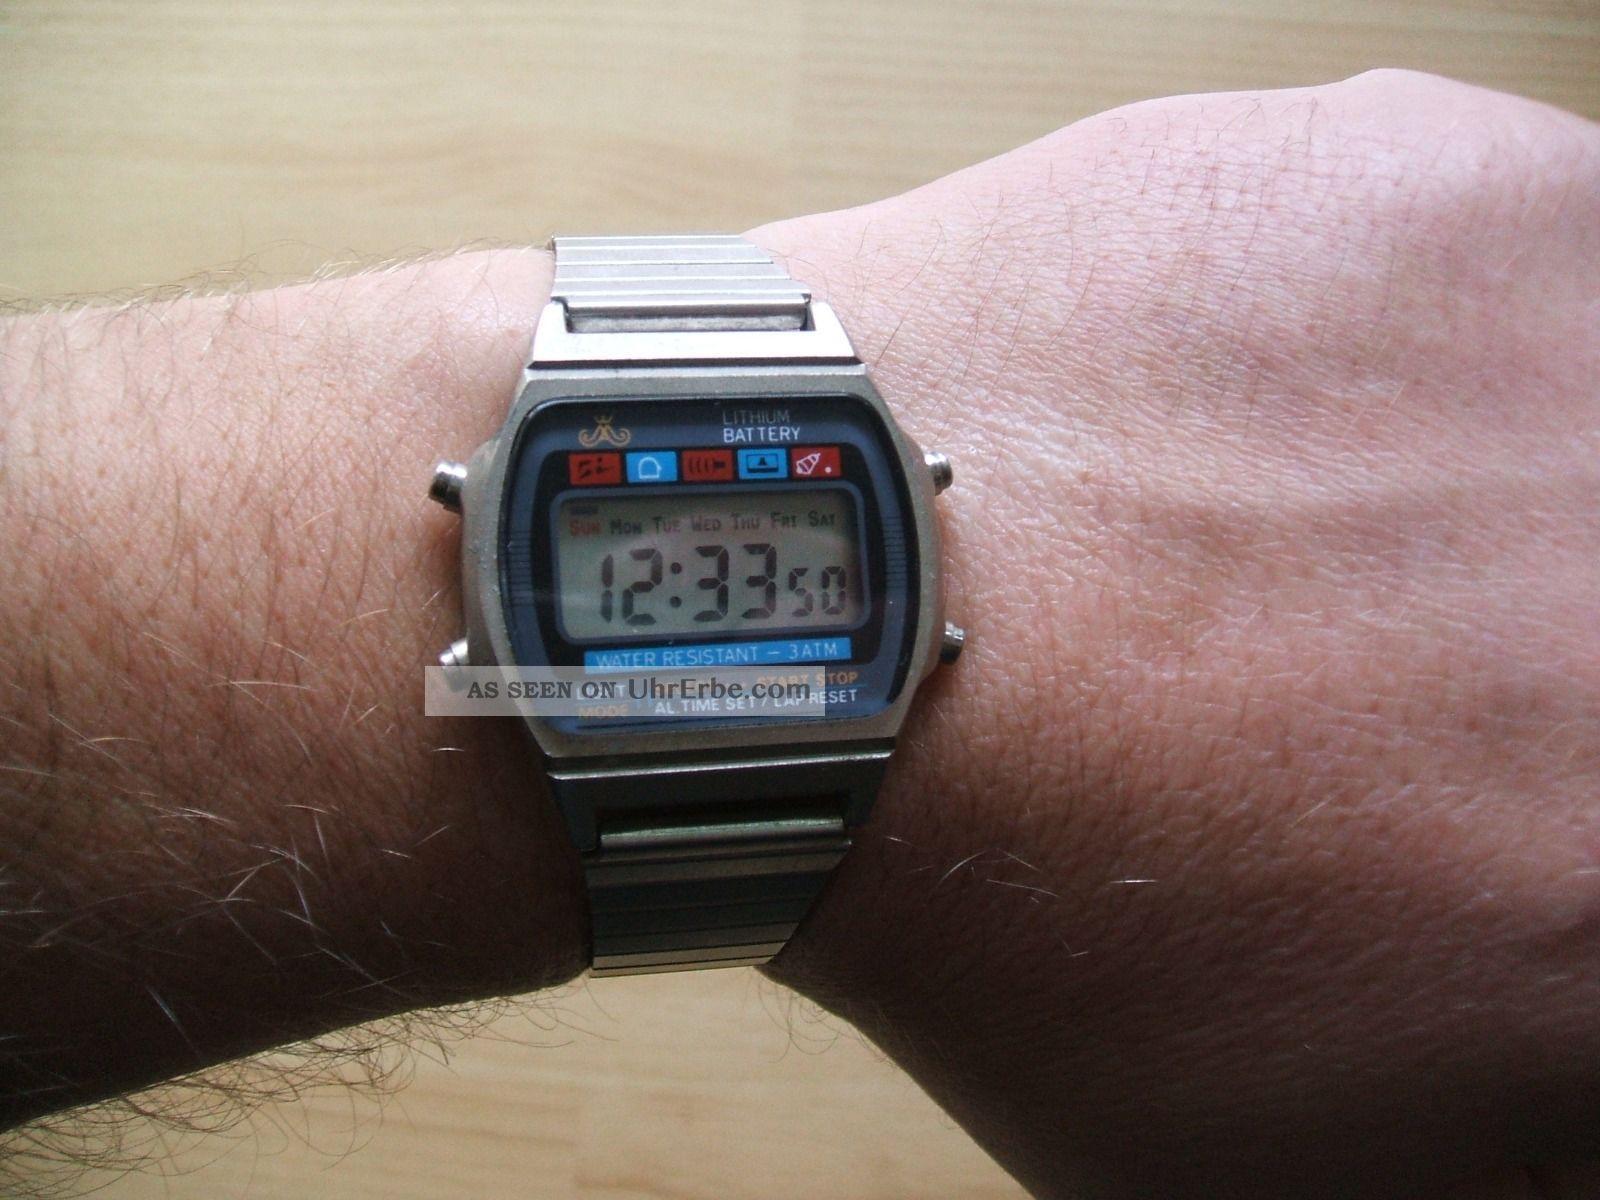 Uhr Sammlung Alte Retro Meister - Anker Cr2016 Digital Herren Armbanduhr Armbanduhren Bild